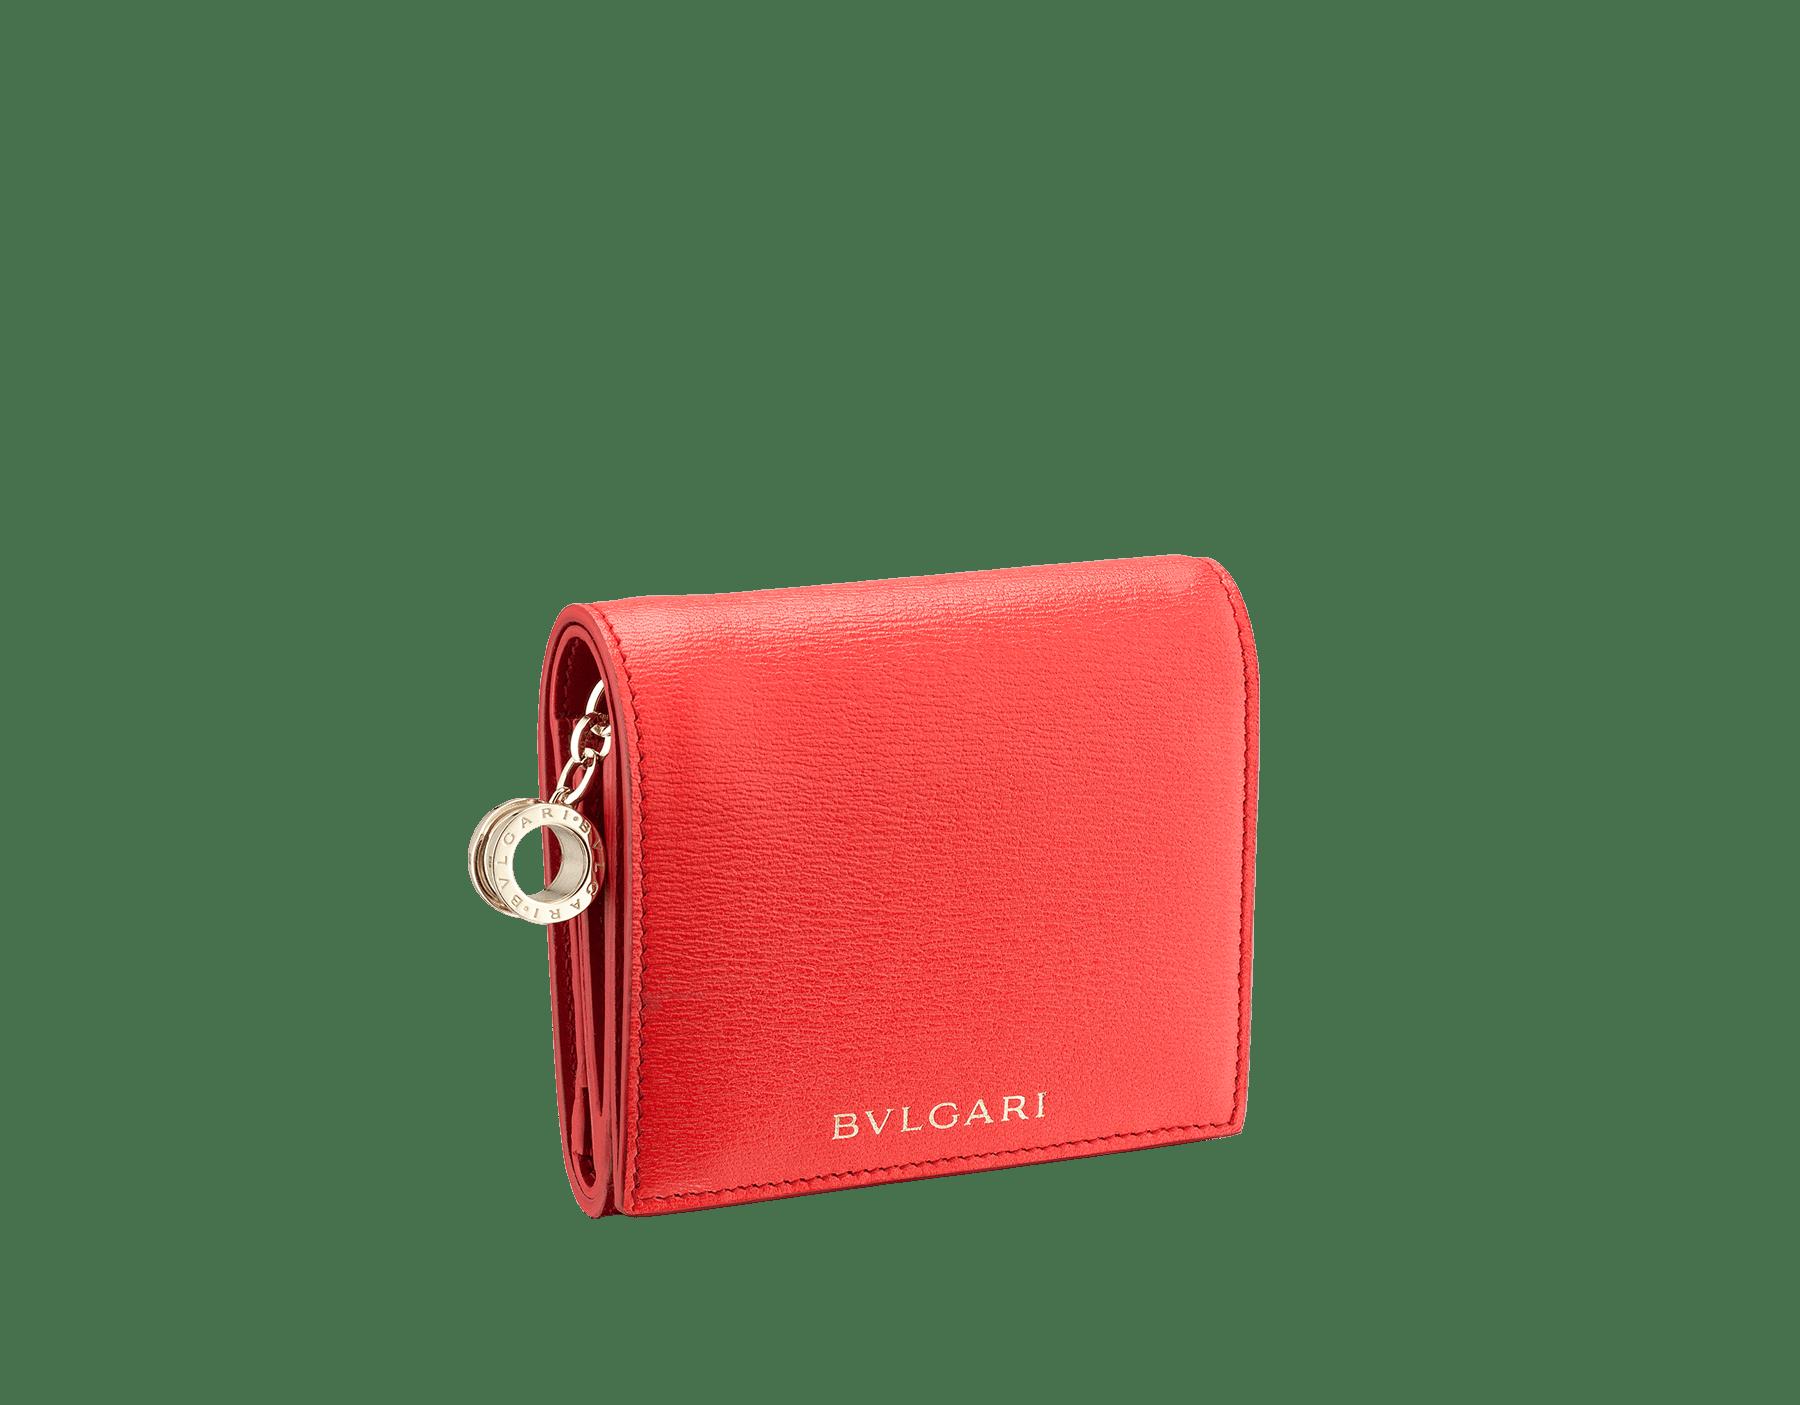 B.zero1 open credit card holder in sea star coral and carmine jasper goatskin. Iconic B.zero1 charm in light gold-plated brass. 288241 image 1